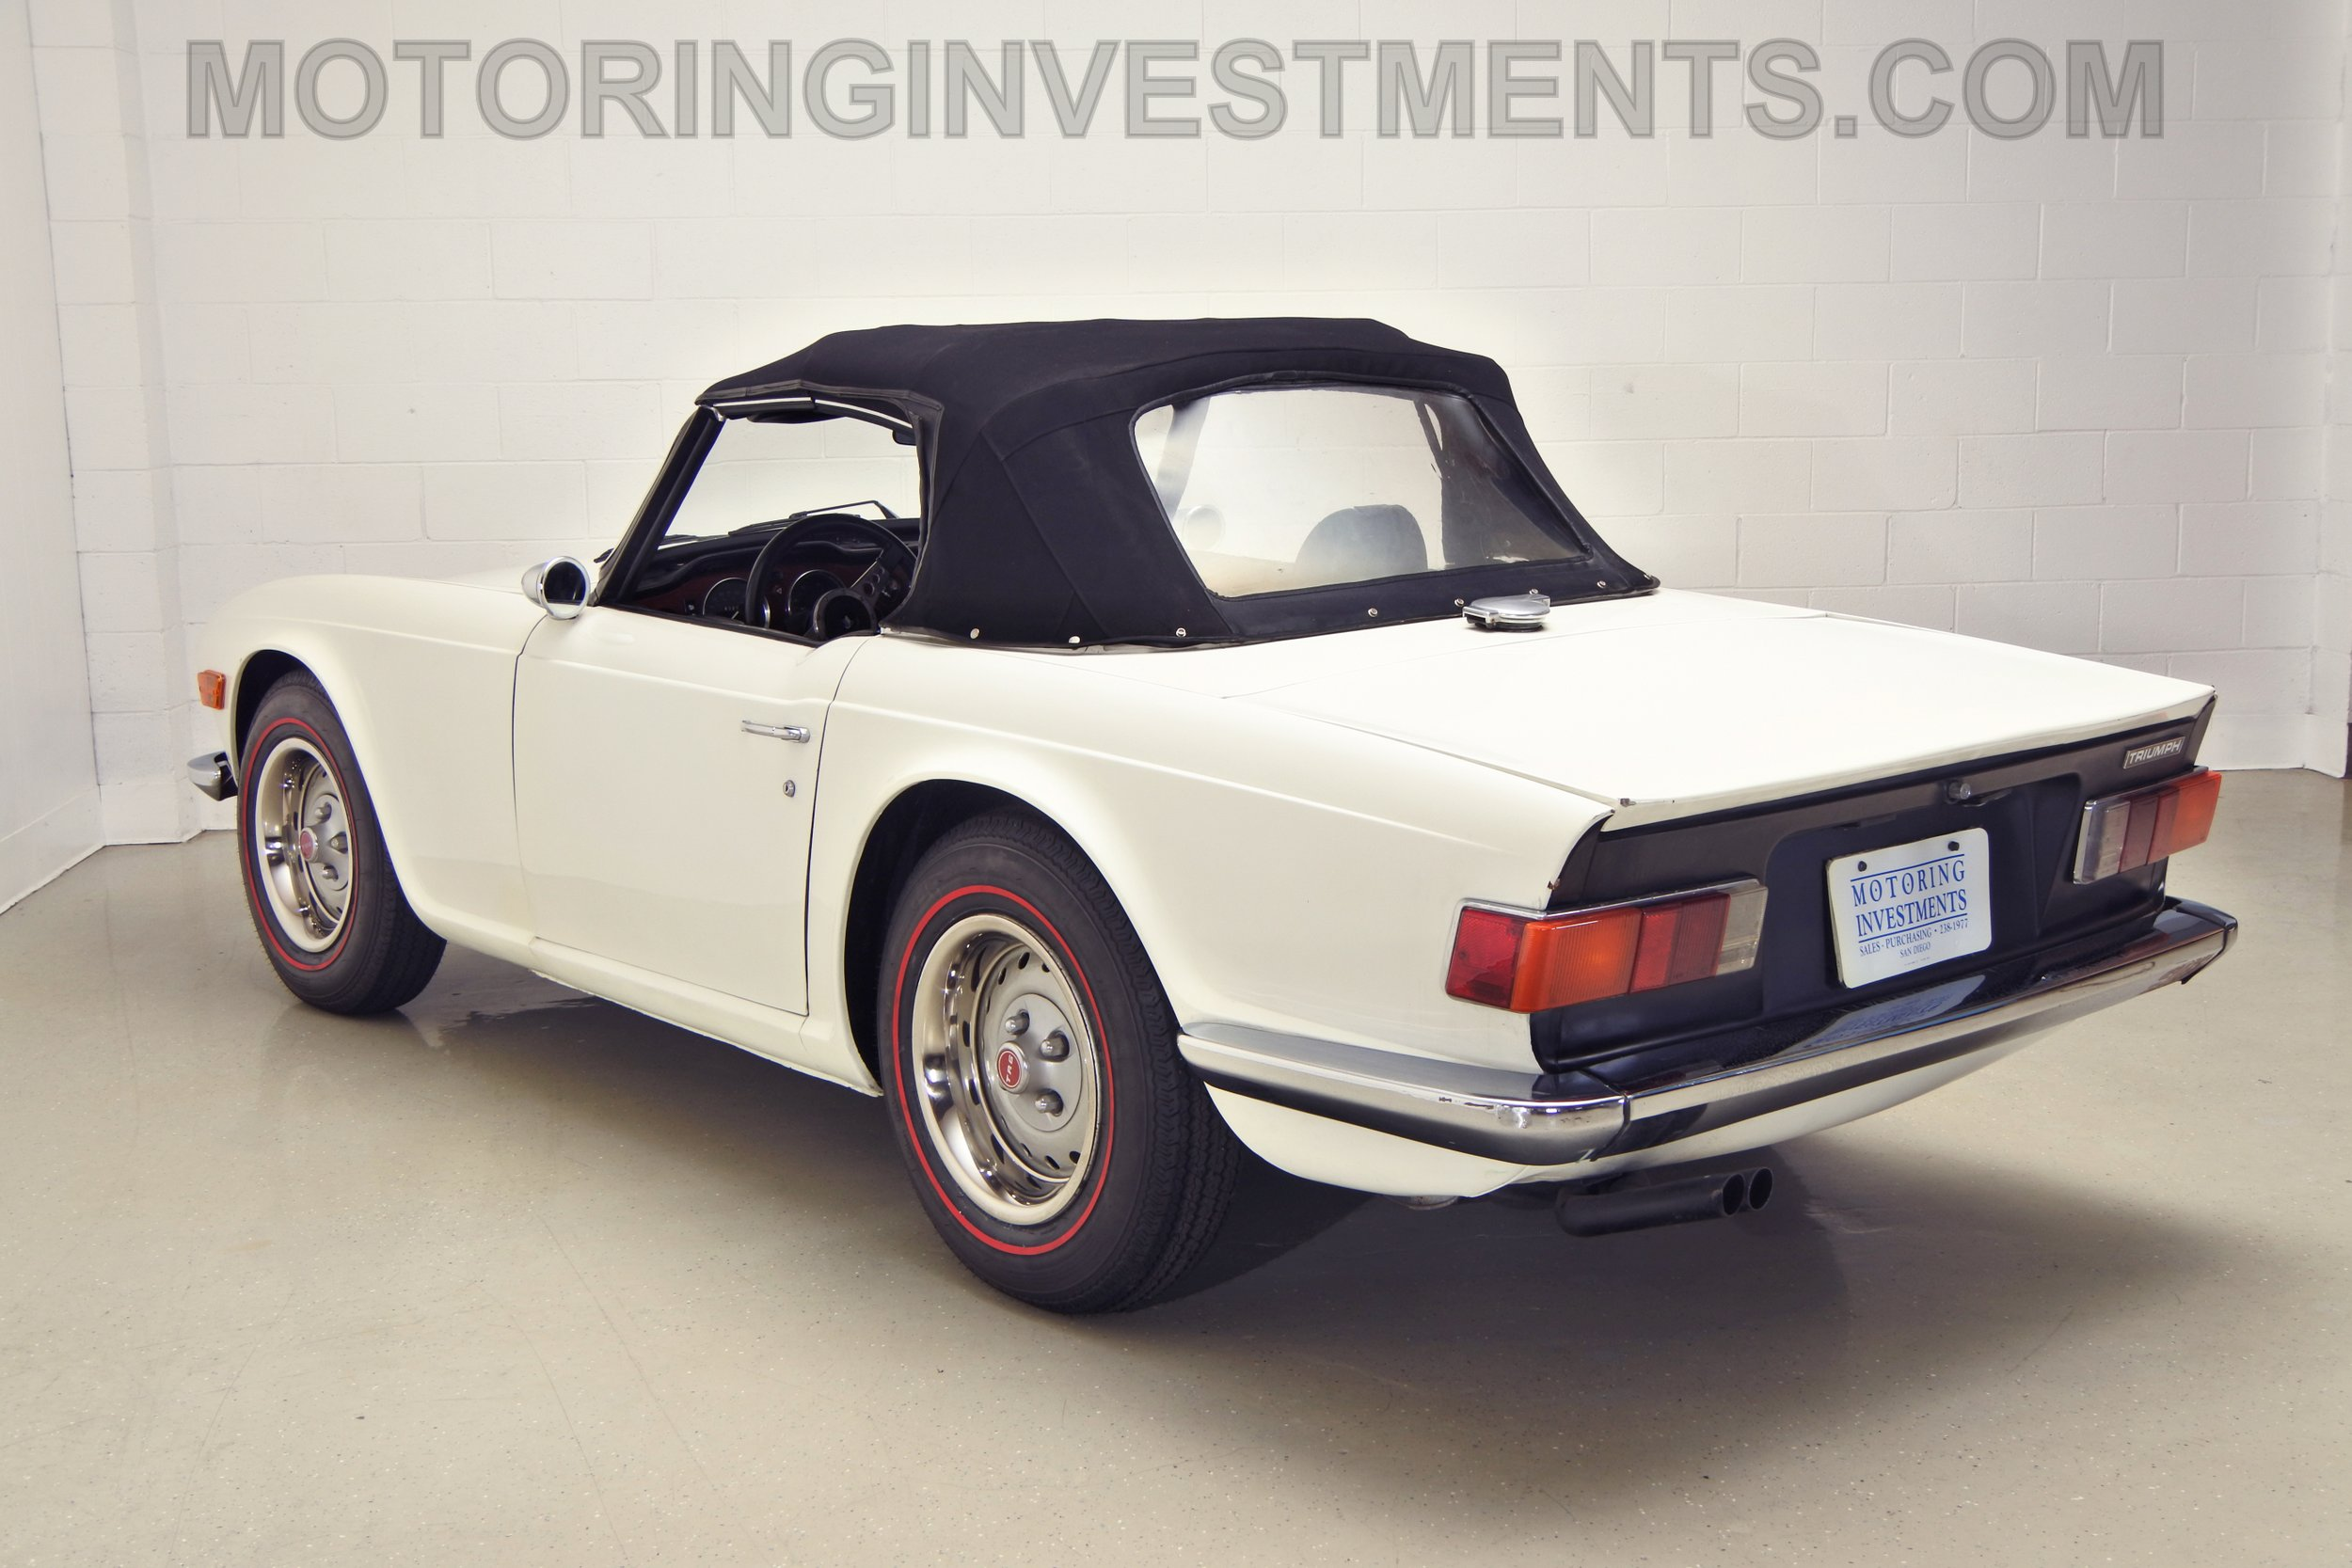 1973 Triumph TR6 - Motoringinvestments com